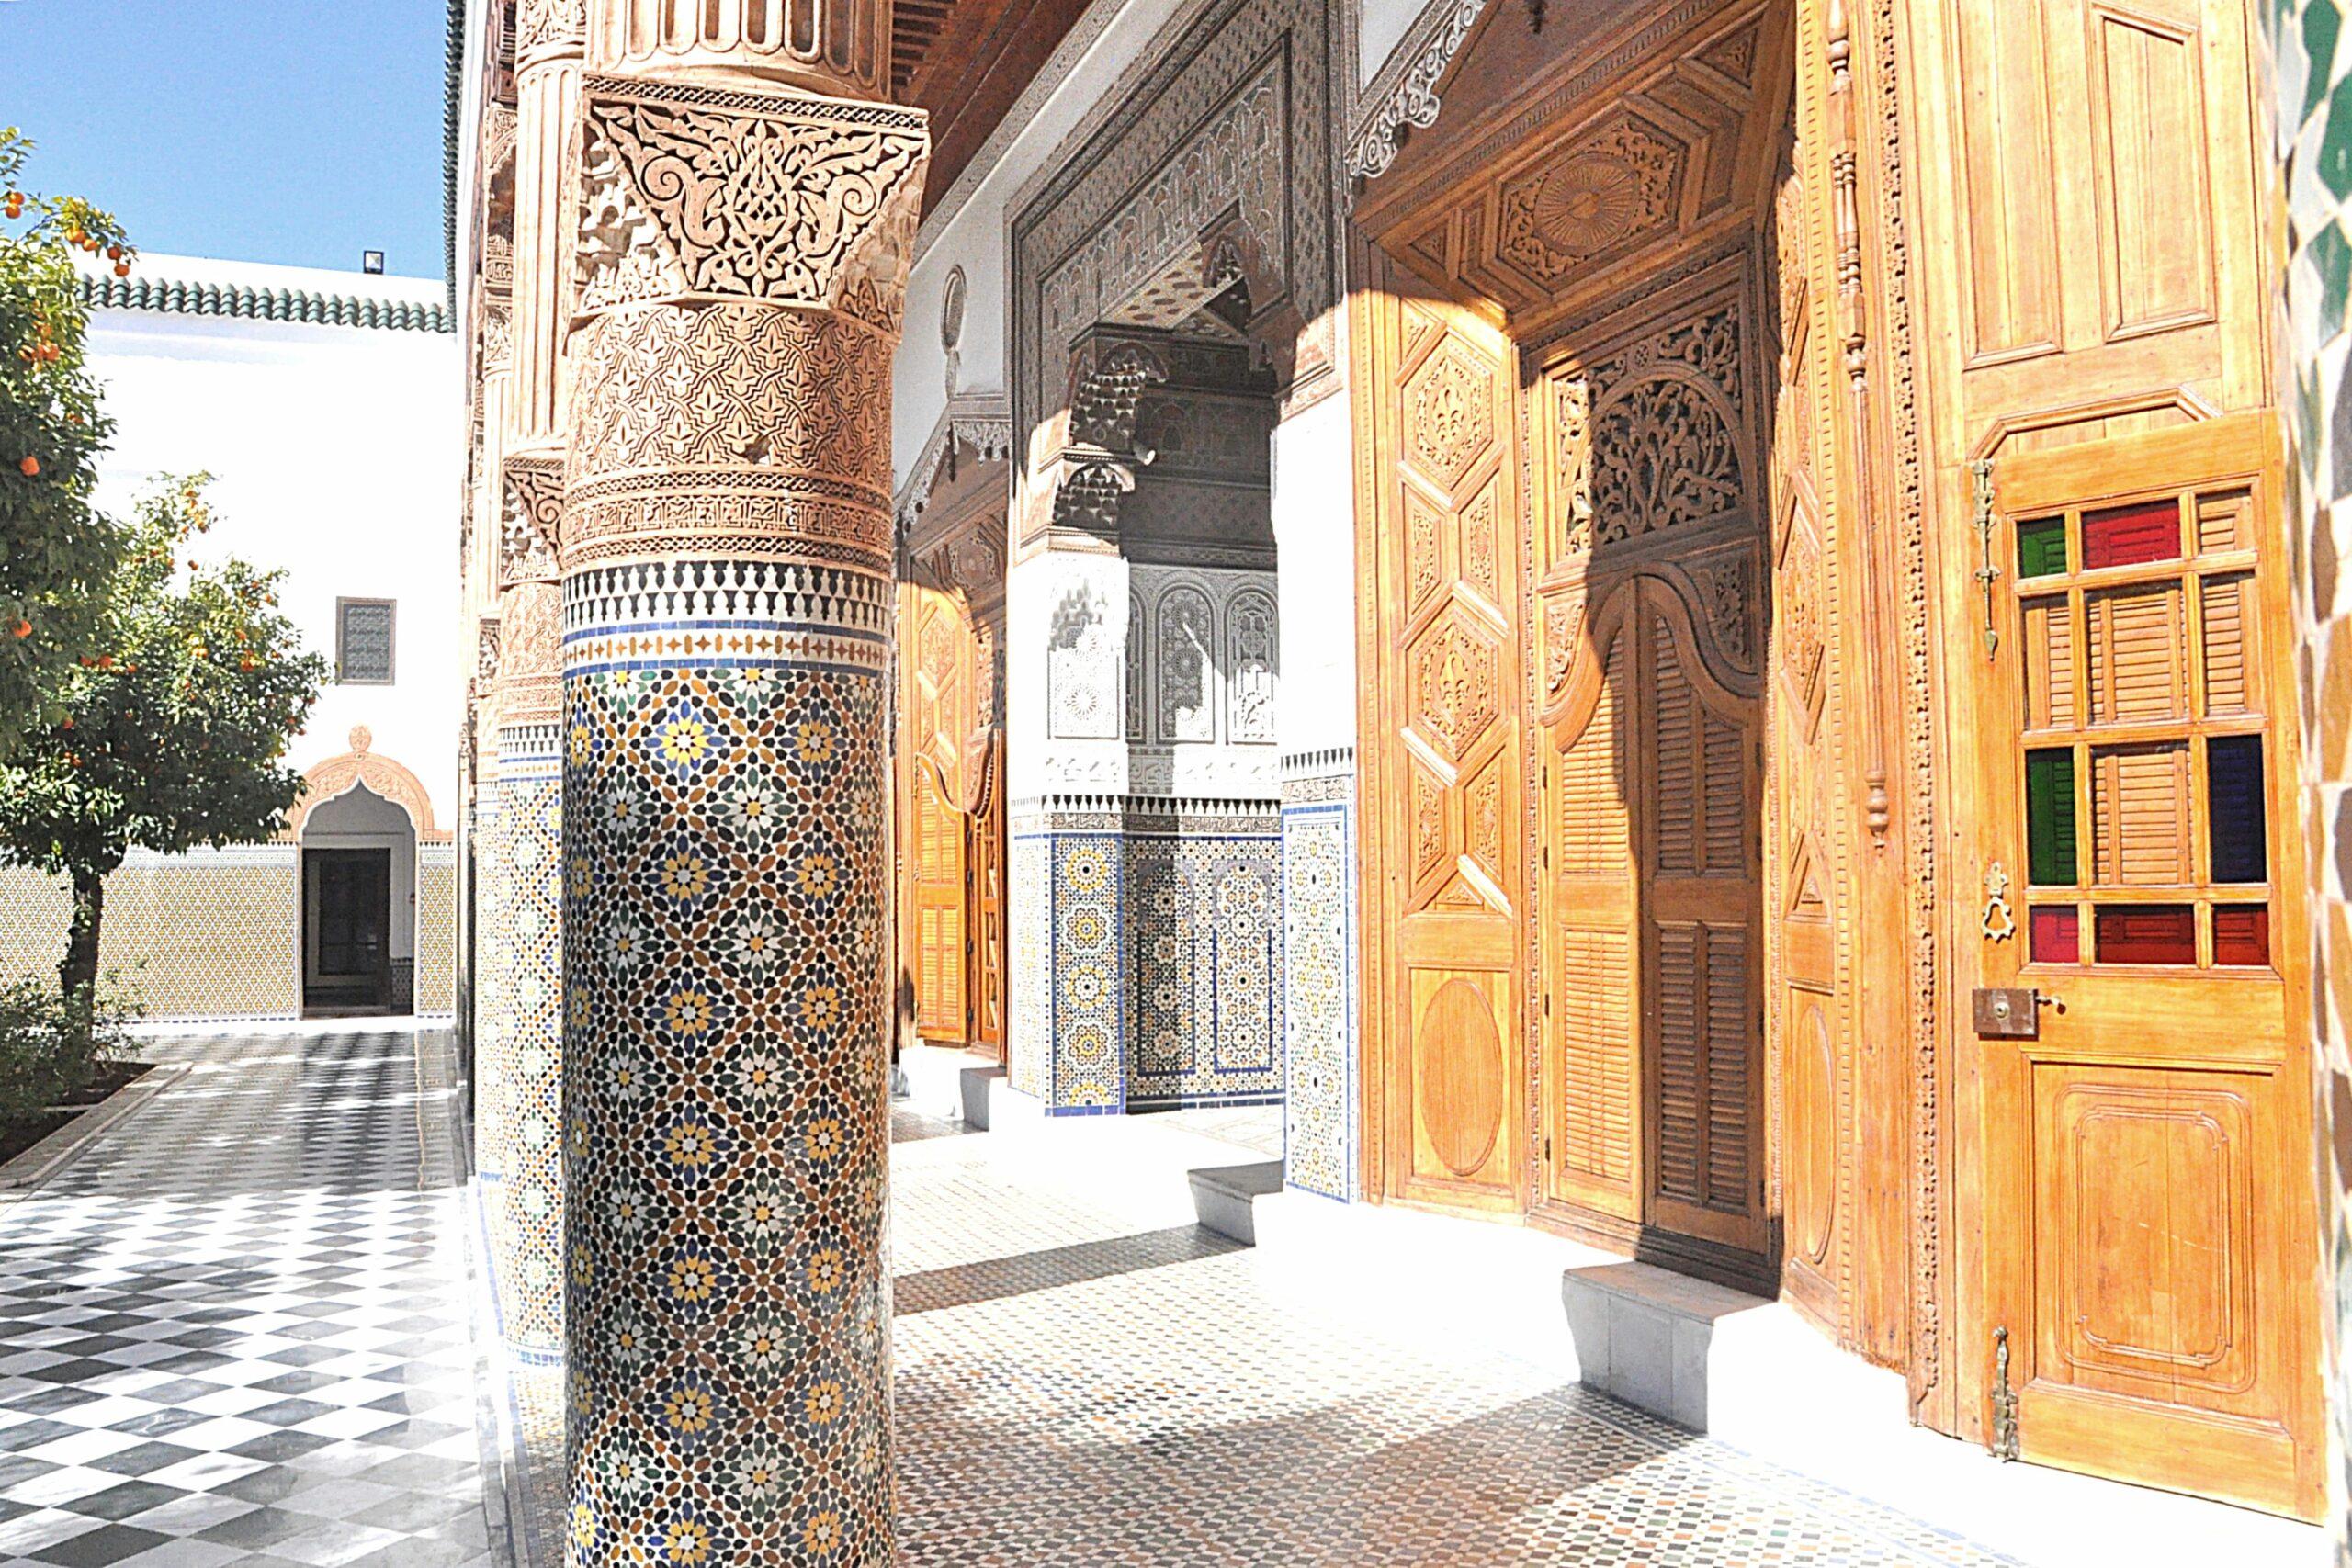 2000 years of Moroccan history at Dar El Bacha museum Marrakech